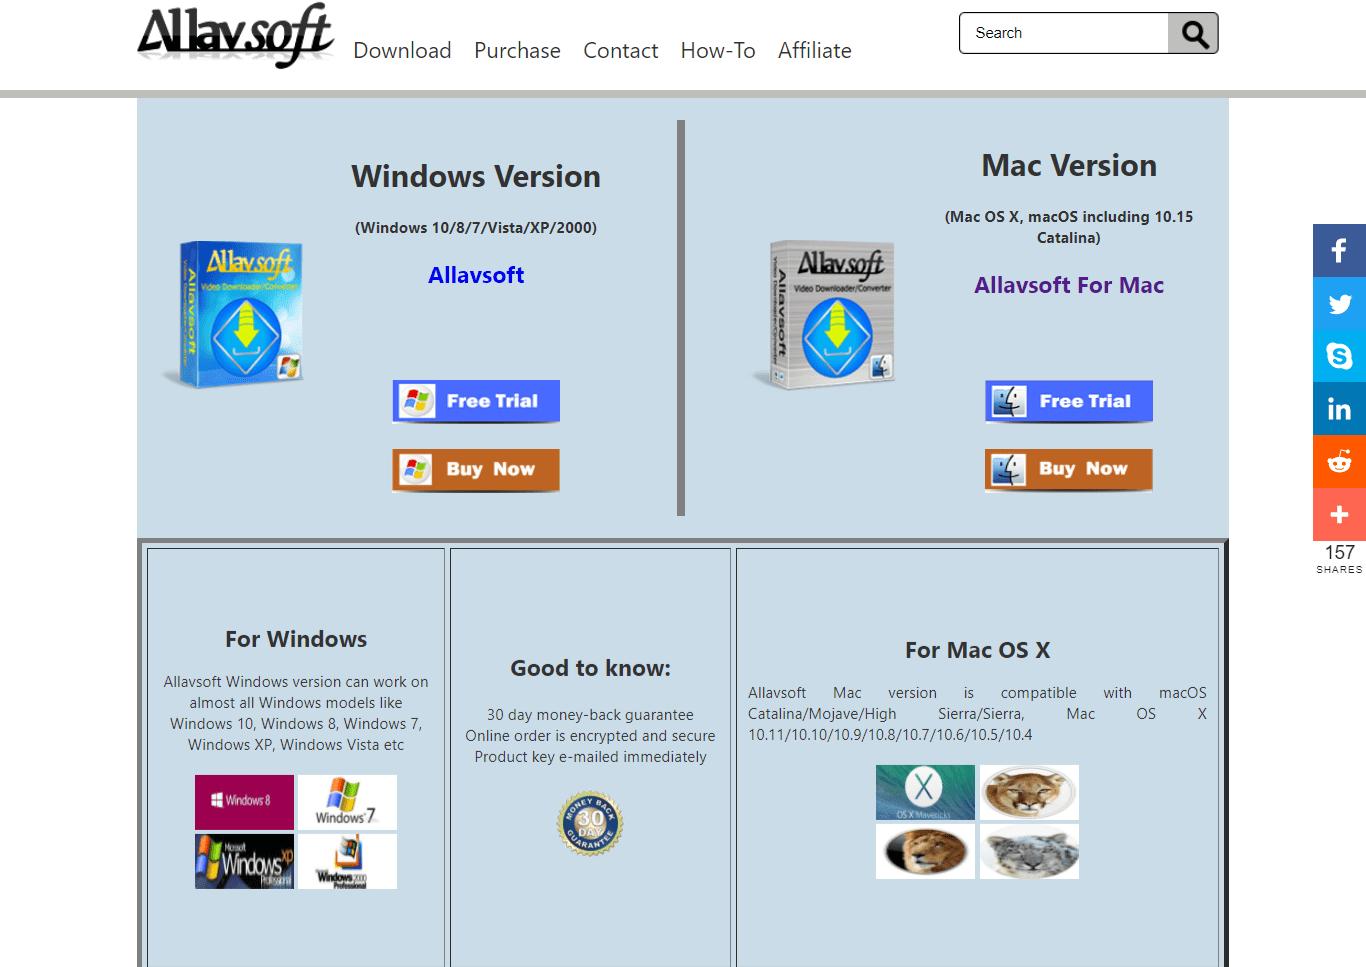 Allavsoft Windows and Mac